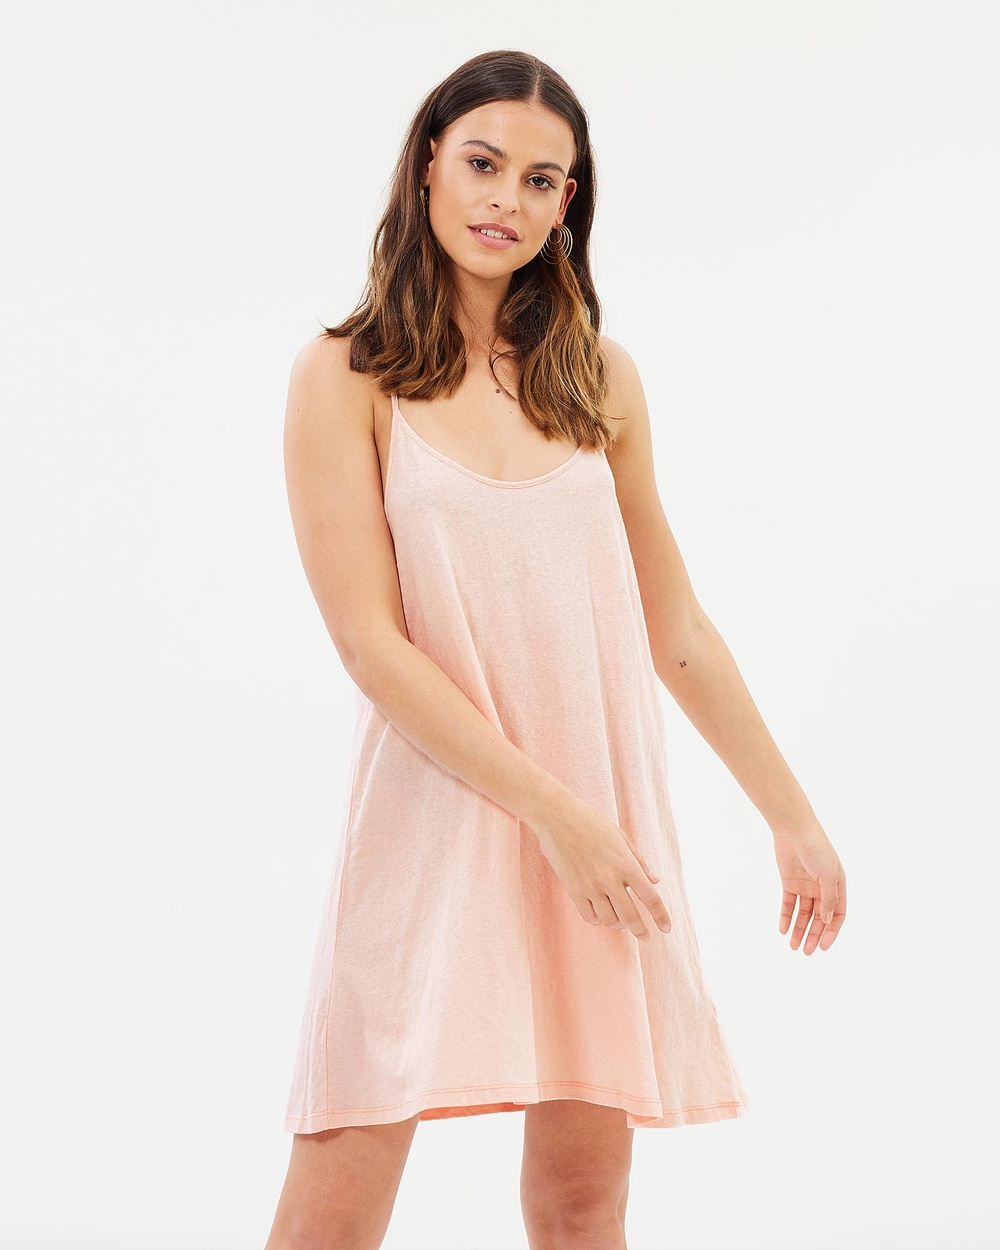 Rusty Bare Tank Dress Dresses Blossom Bare Tank Dress